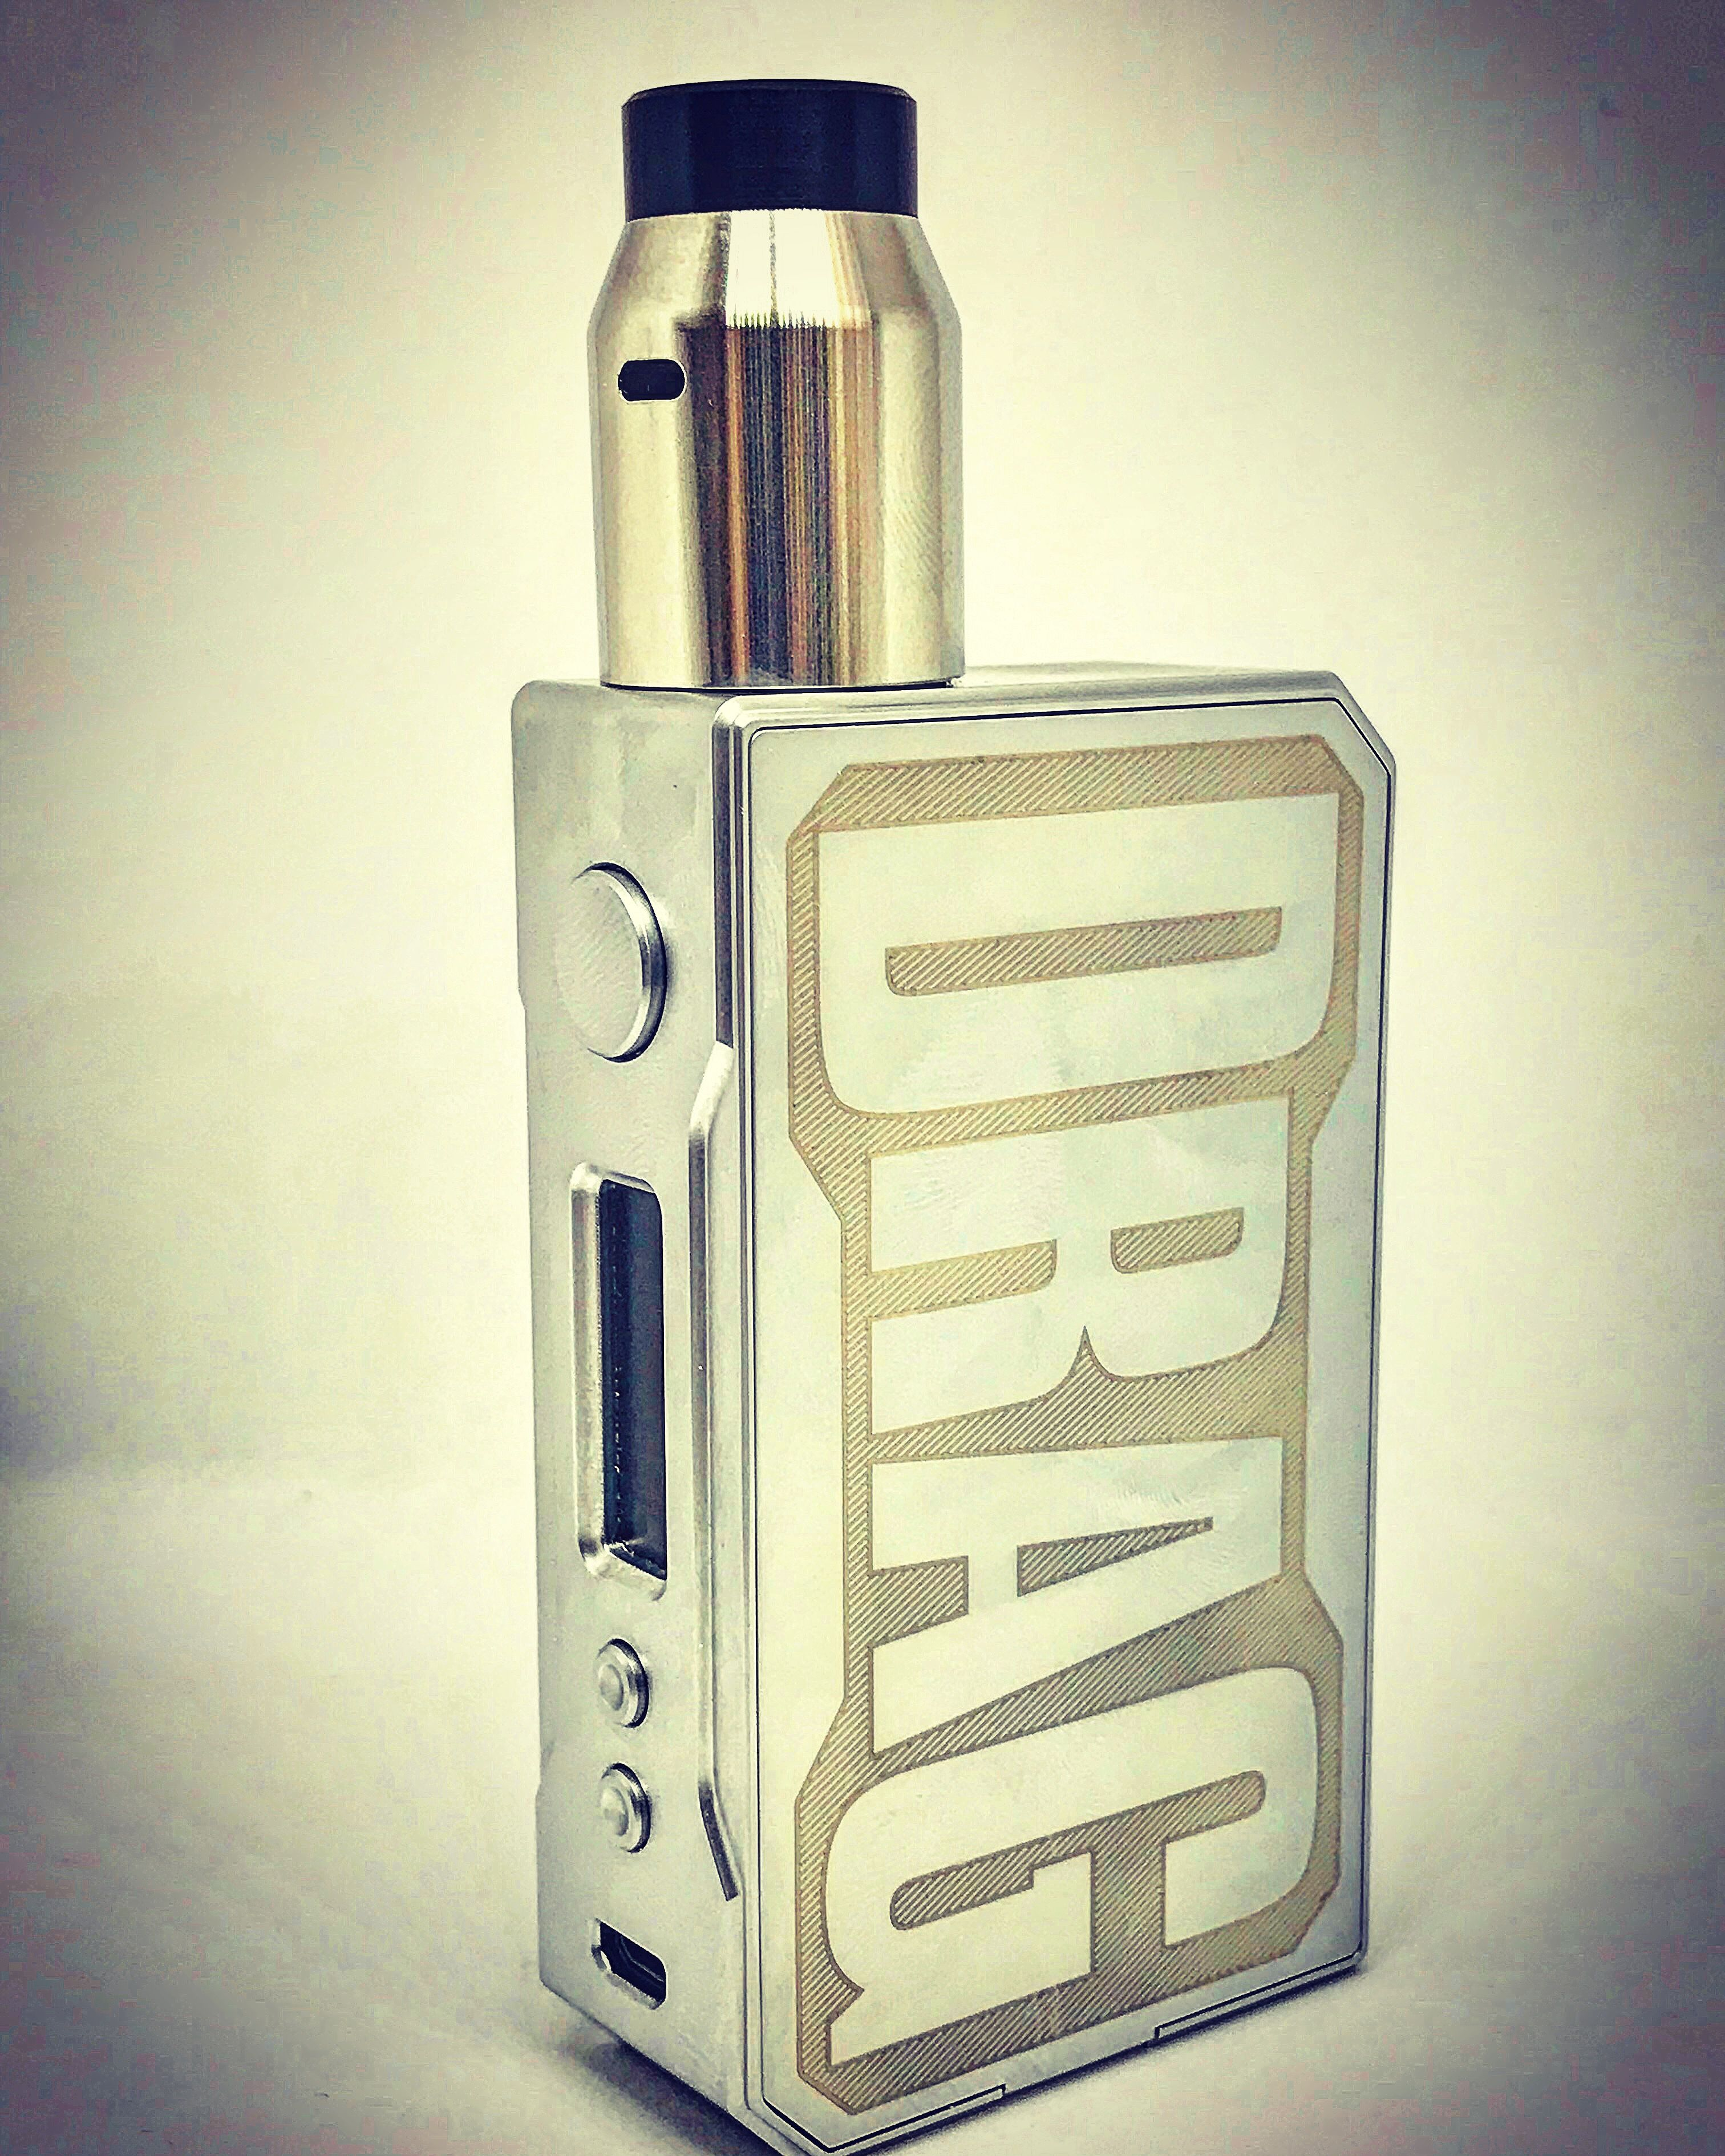 Pin by Simply Vapour on VAPE   Vape, Vape accessories, Vape smoke